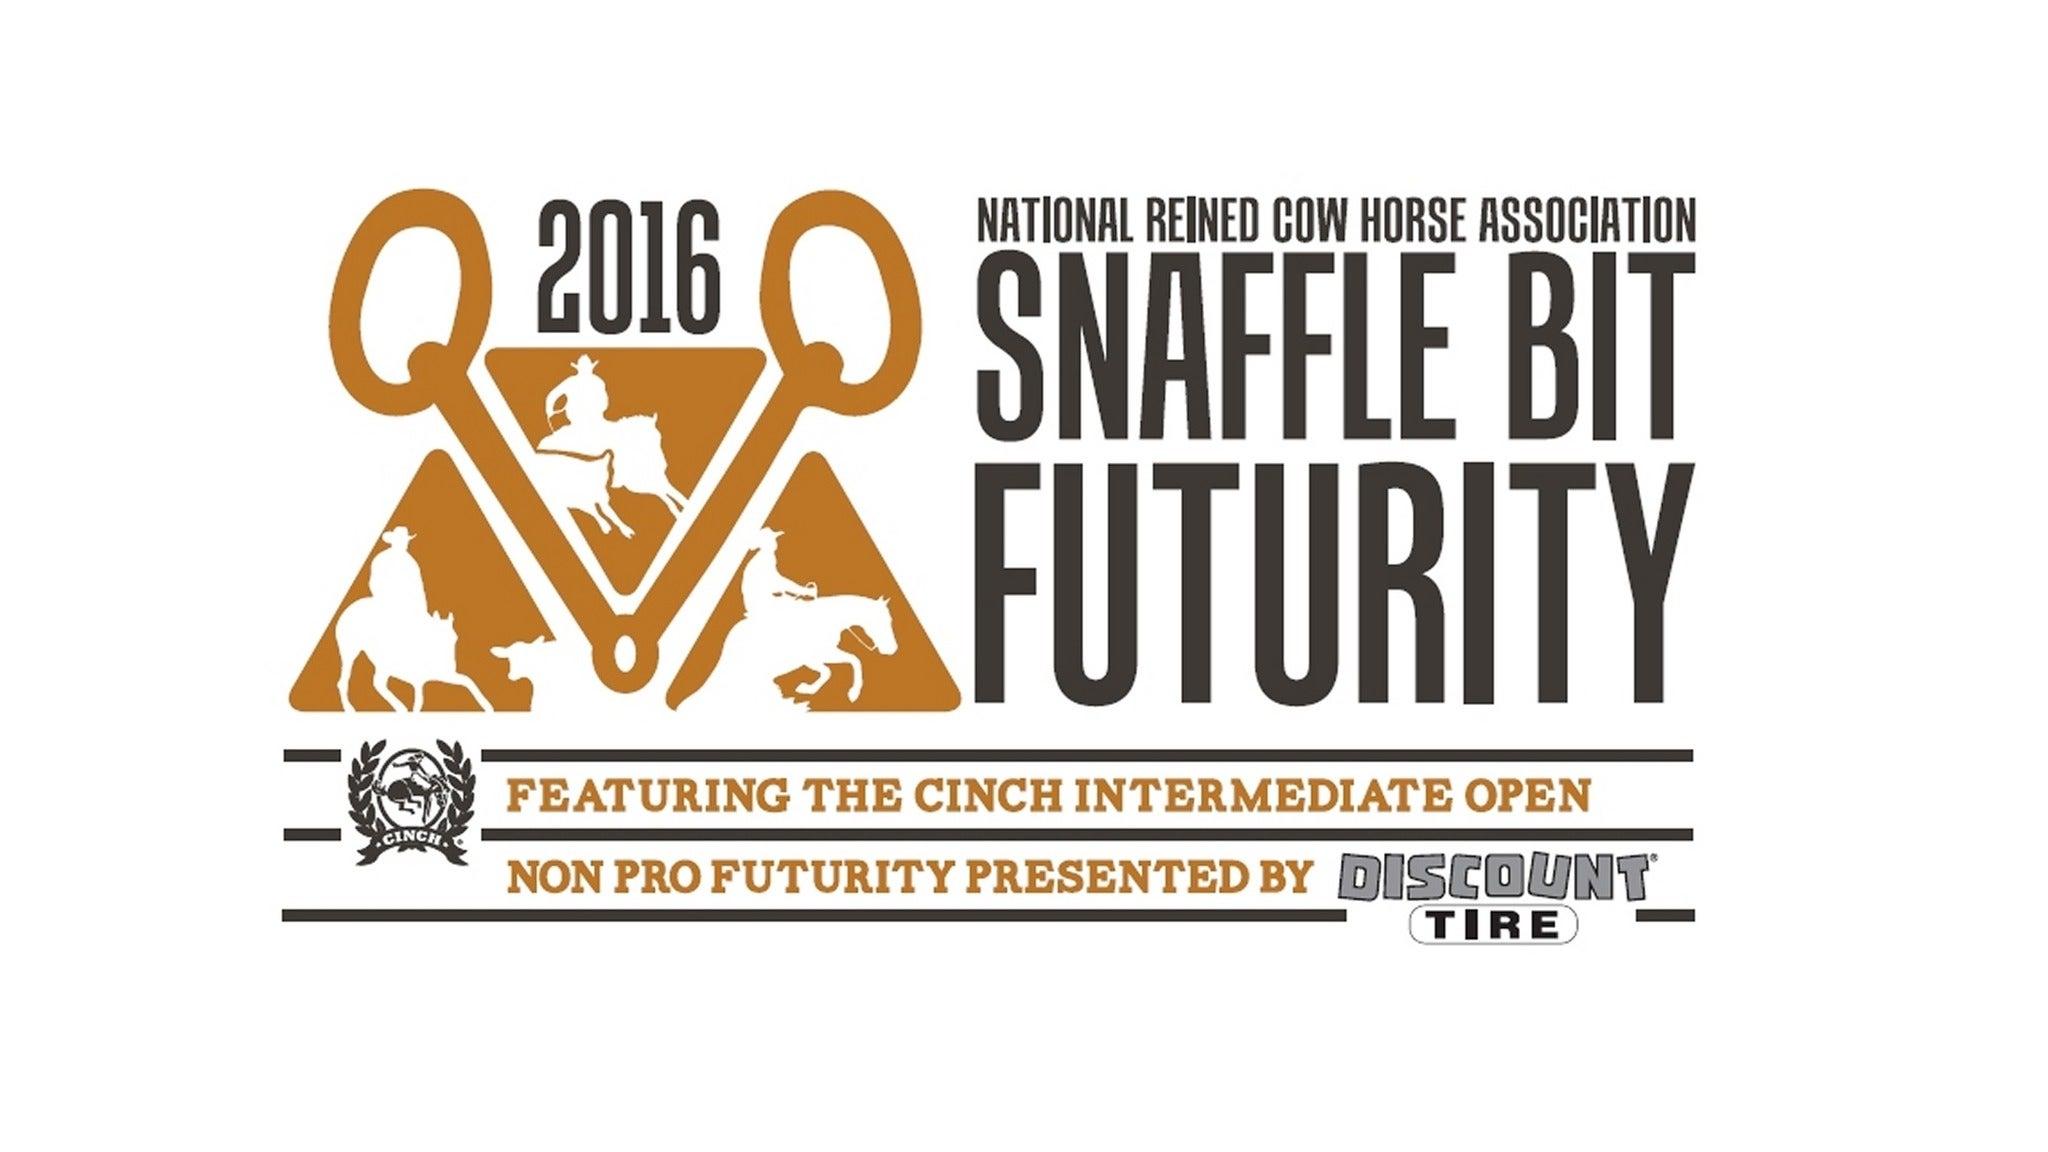 NRCHA Snaffle Bit Futurity at Reno Livestock Events Center